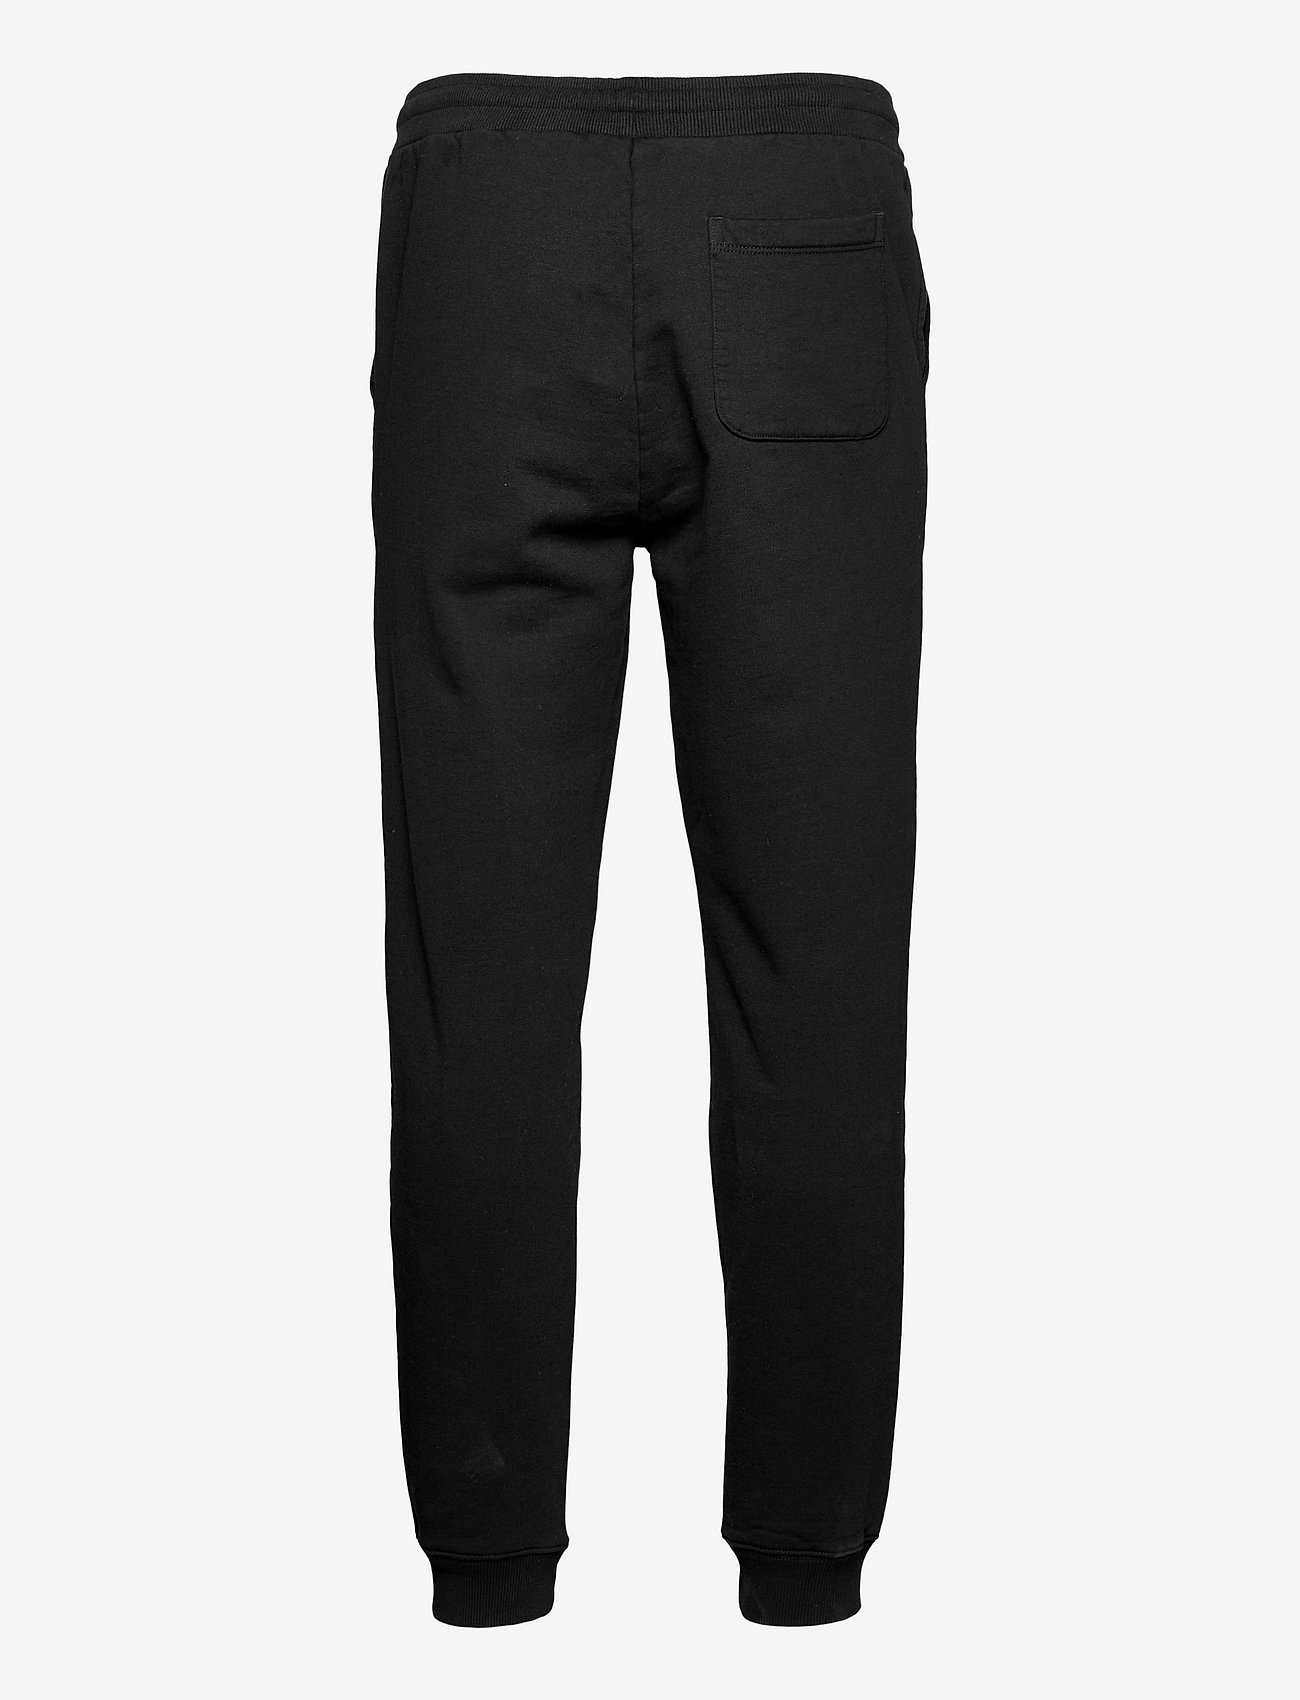 Samsøe Samsøe - Norsbro trousers 11720 - kleding - black - 1